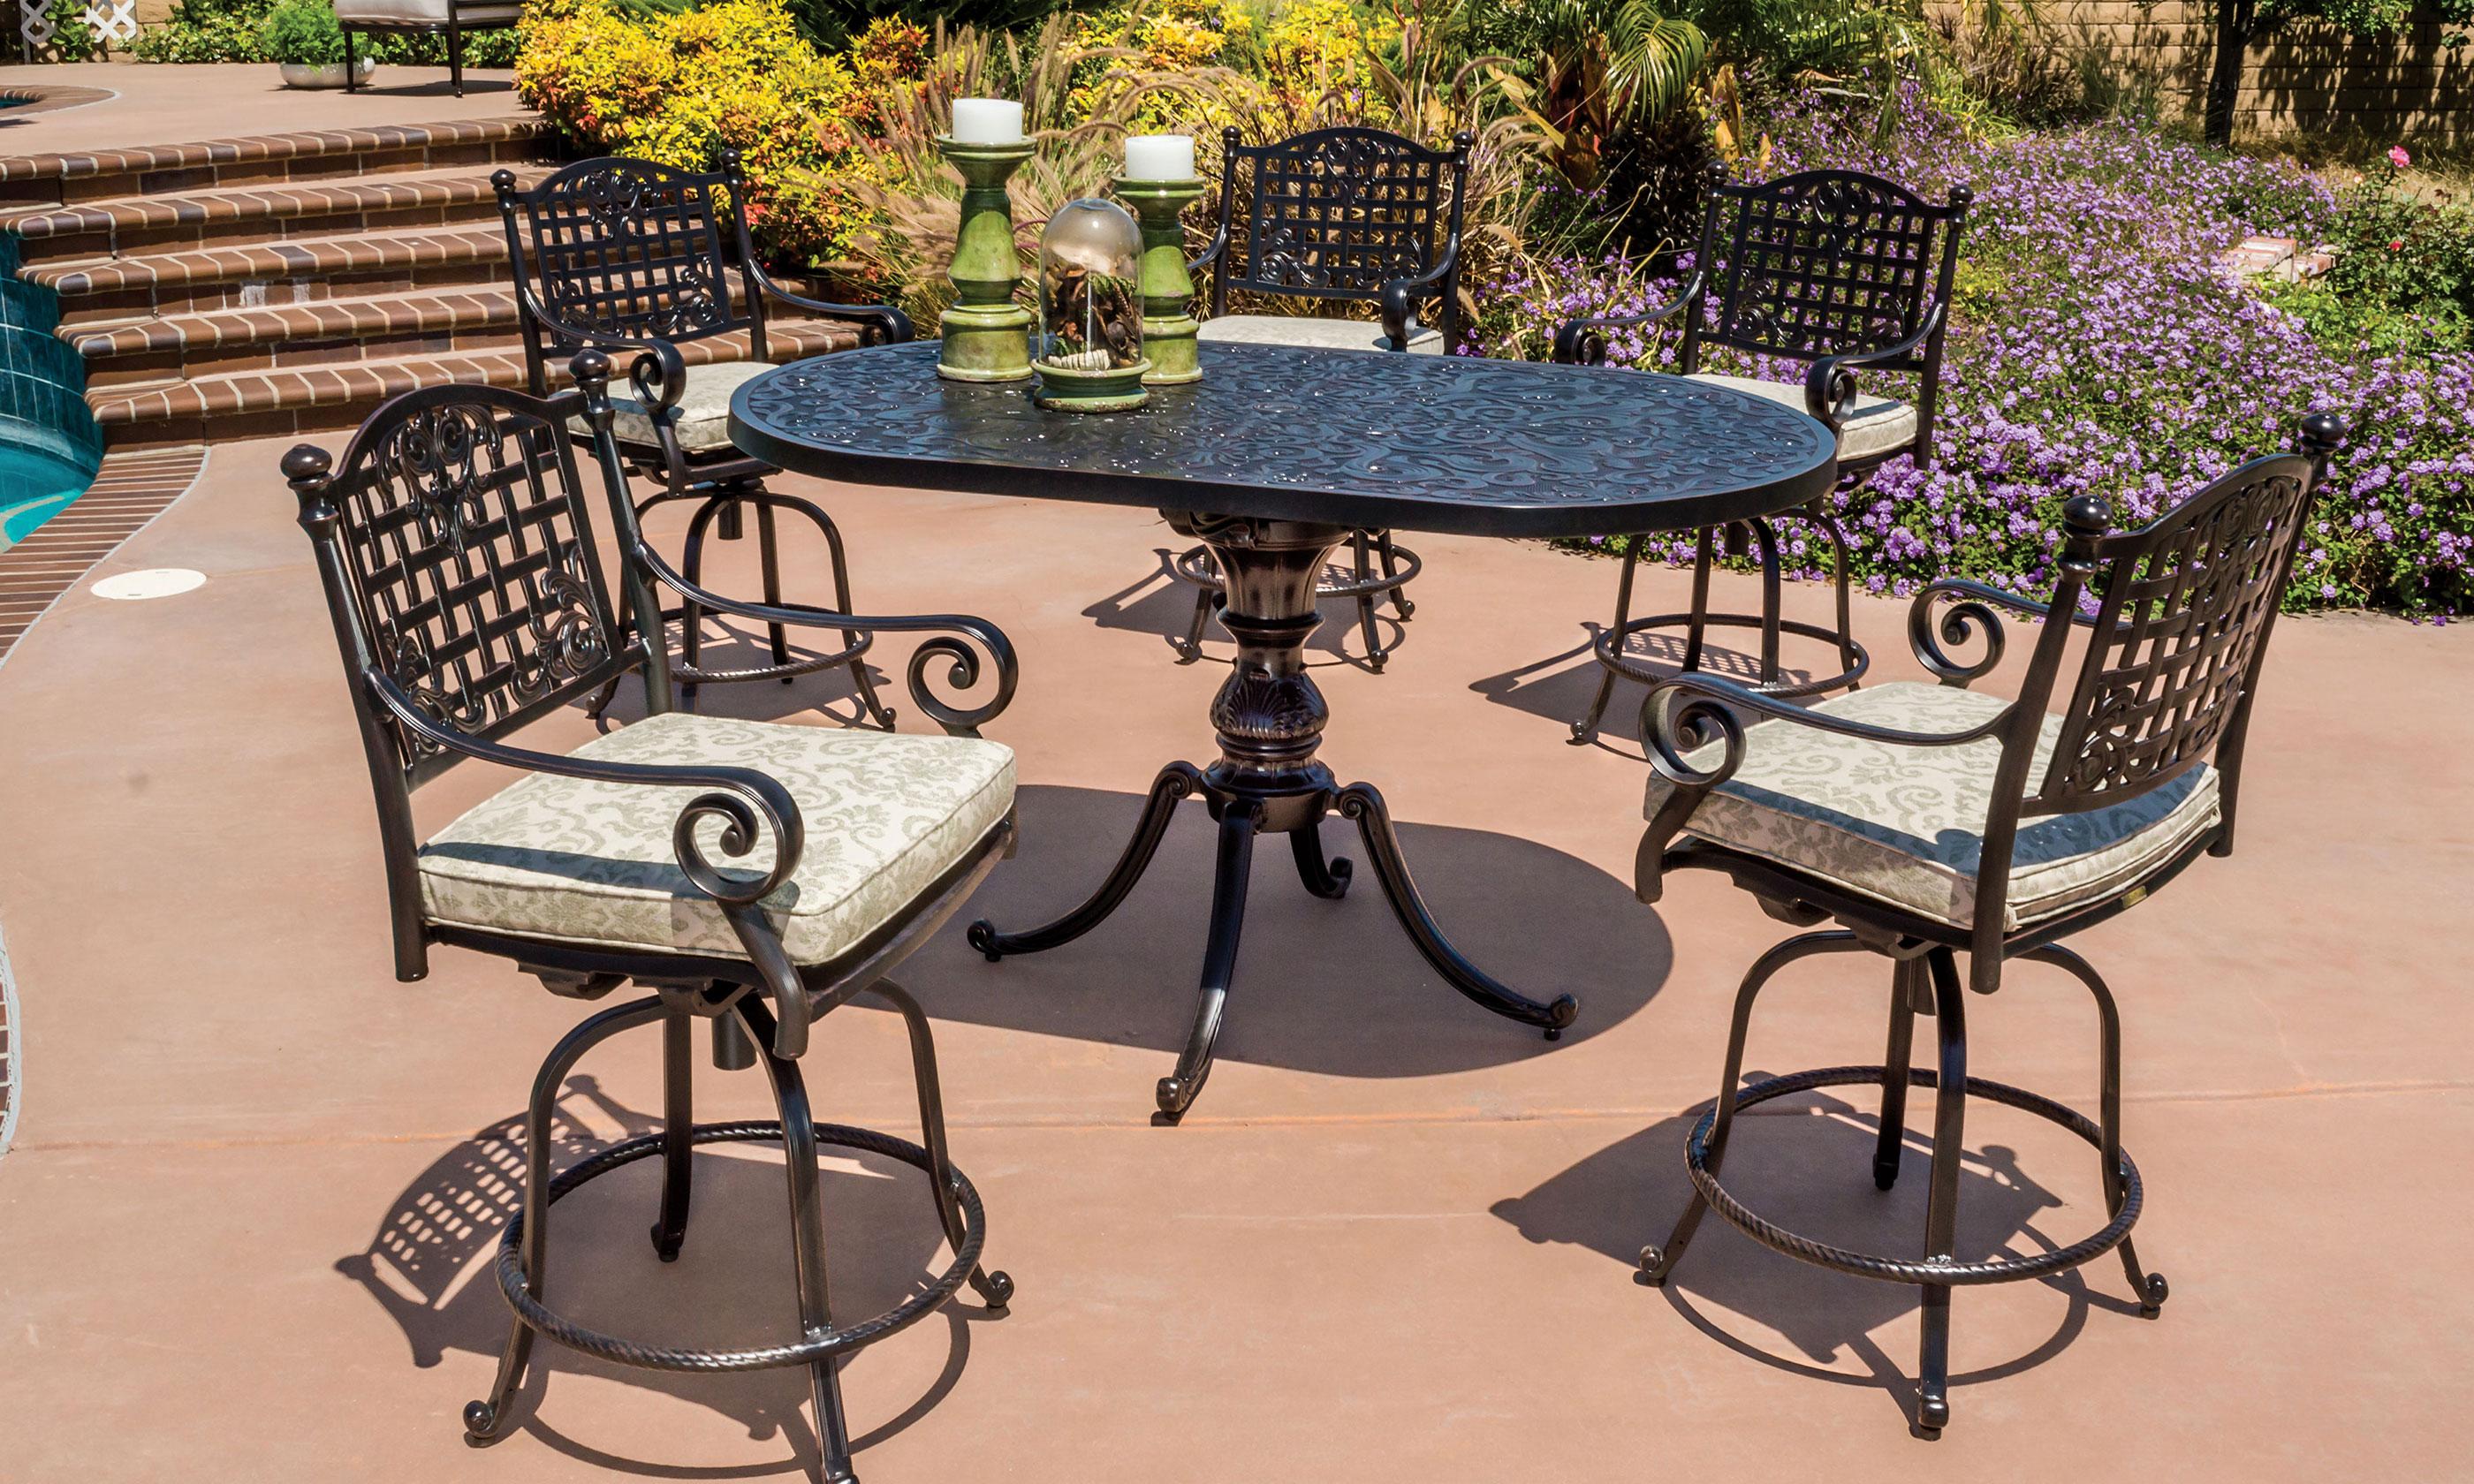 Outdoor Furniture > Furniture Collections > Verona - Gensun